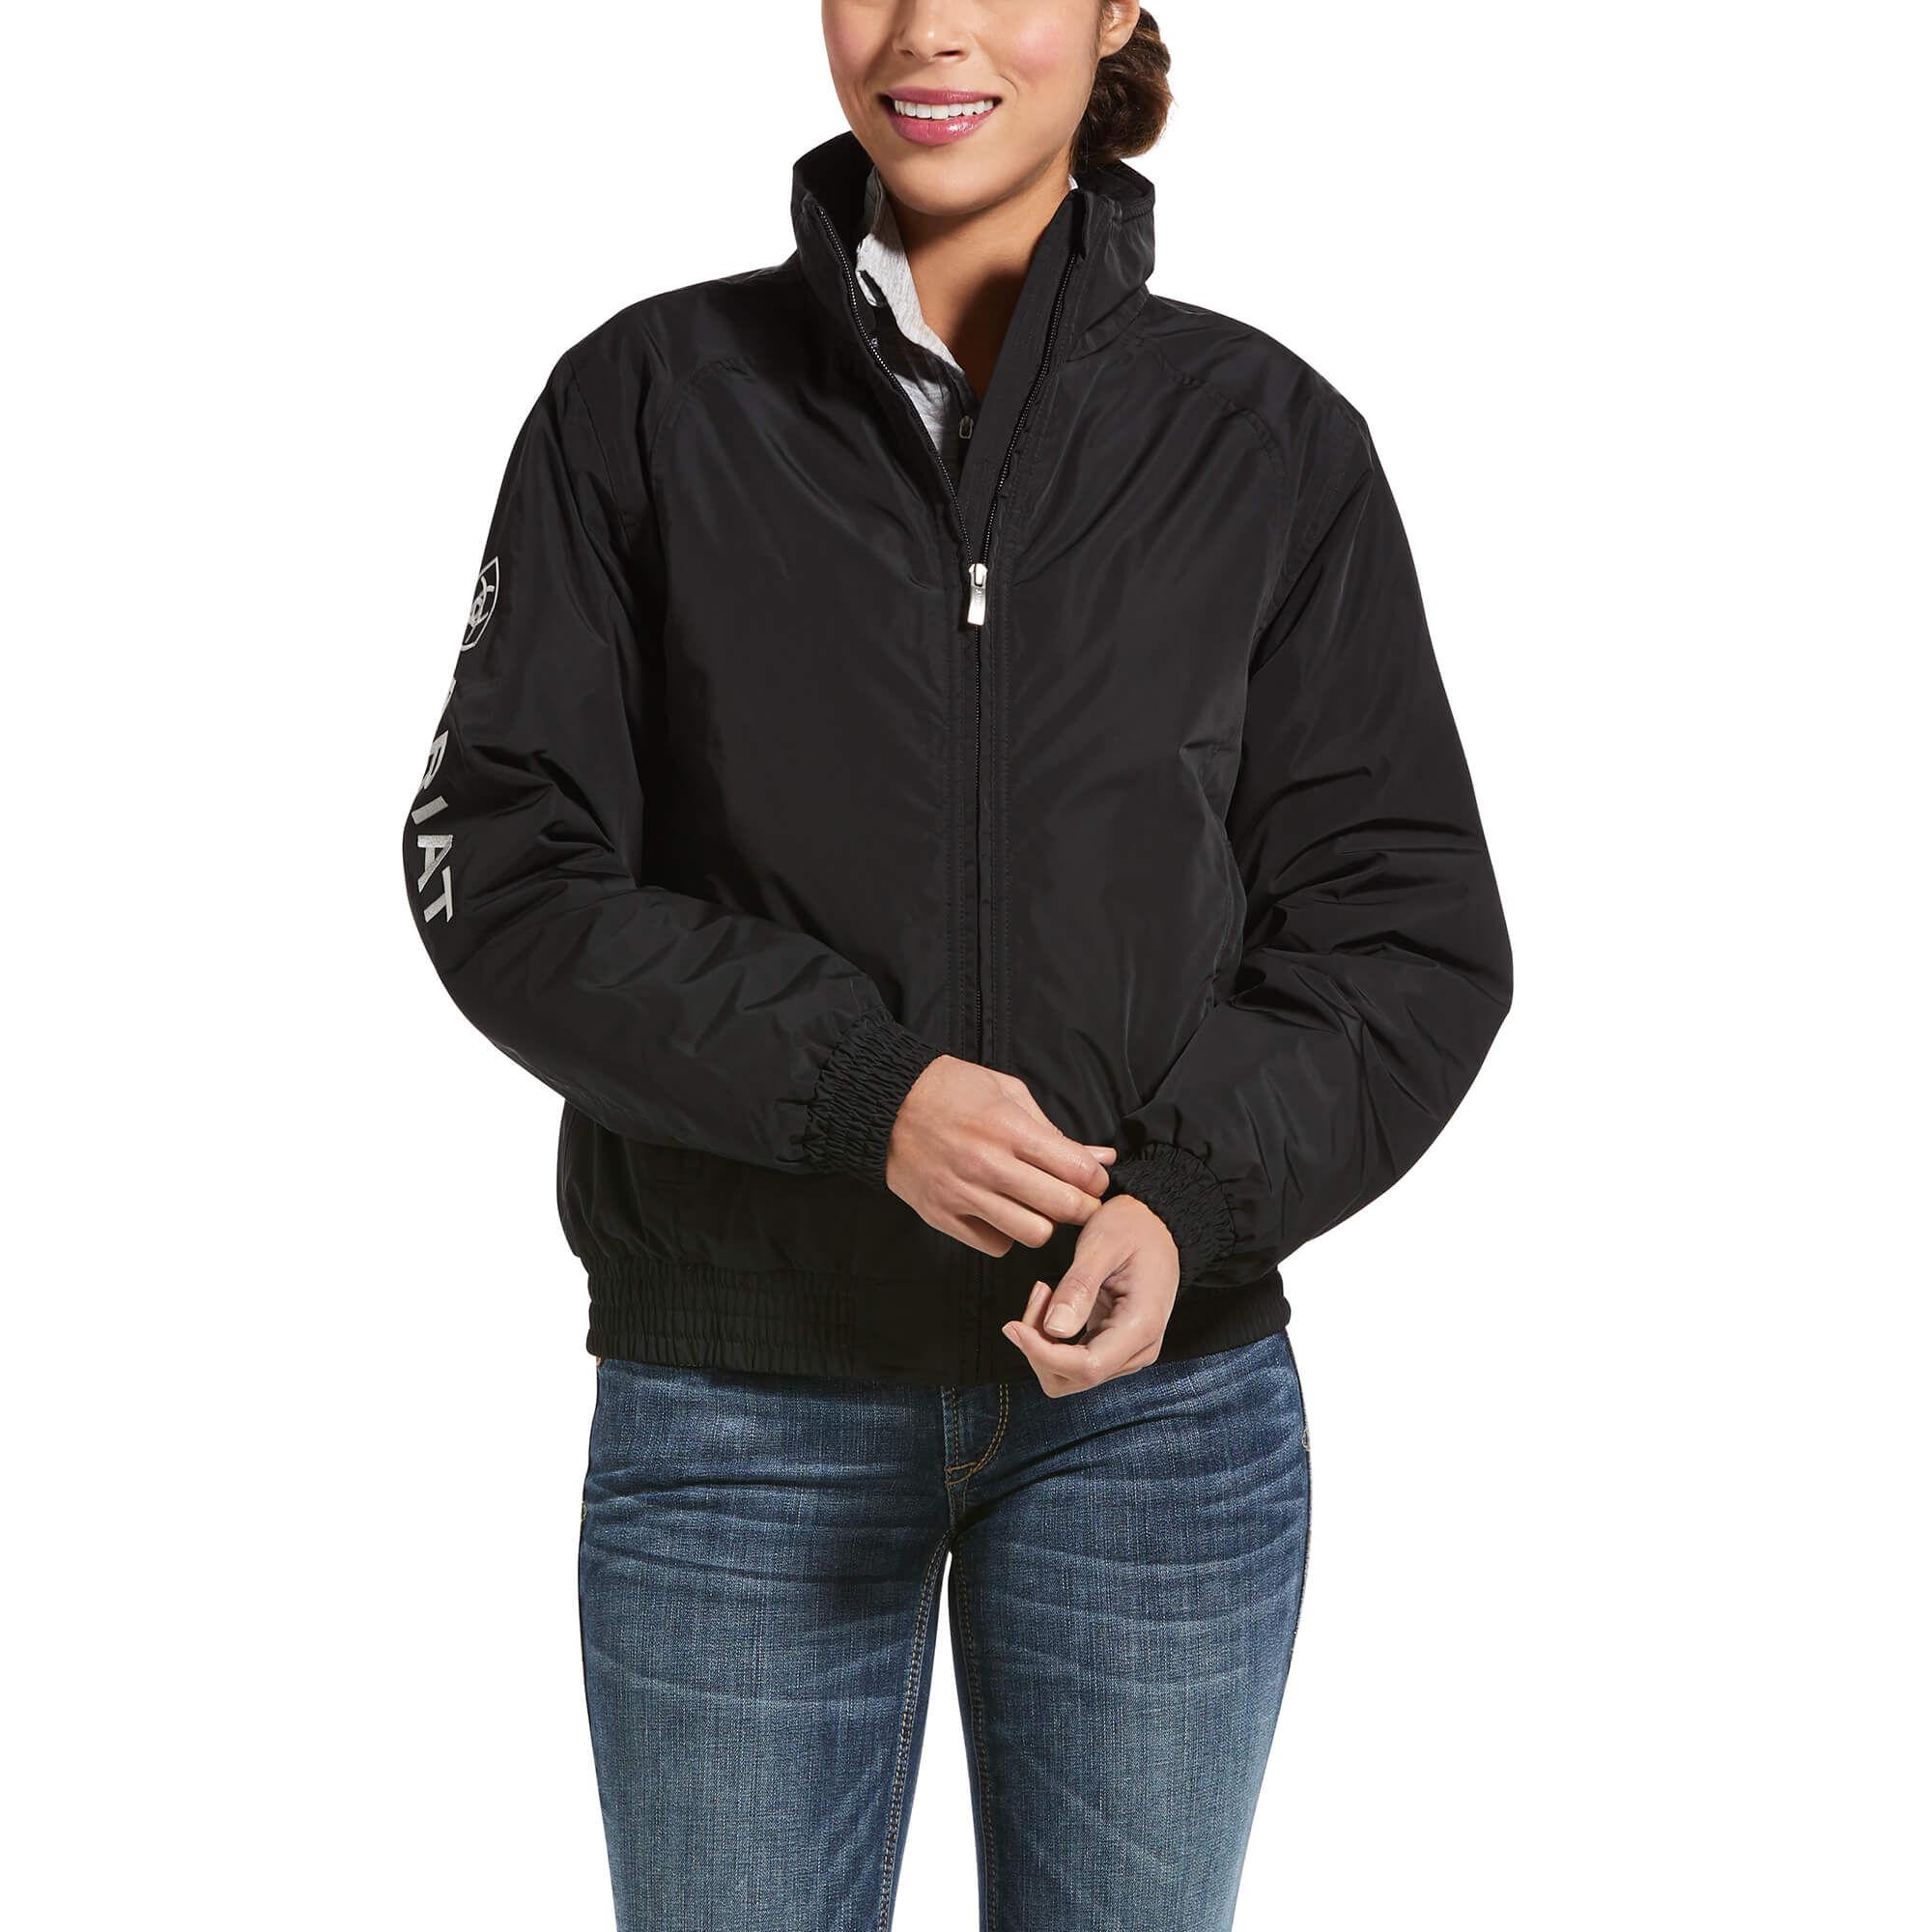 XL NEW Ariat Mens Stable Team Jacket Navy Sizes L